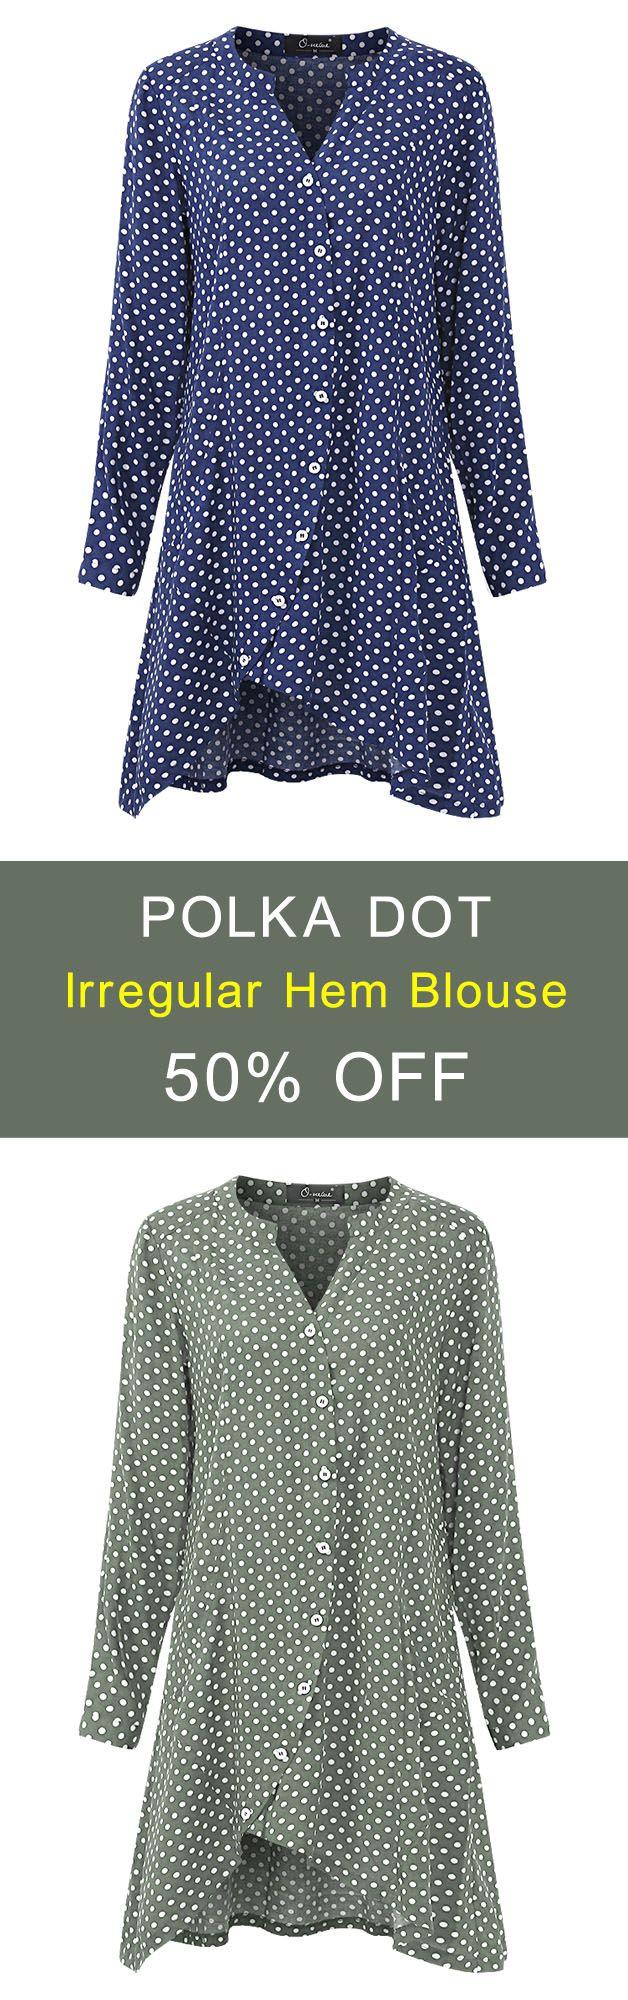 O-NEWE L-5XL 6 Colors Polka Dot Irregular Hem Blouse. #women #blouse #fashion